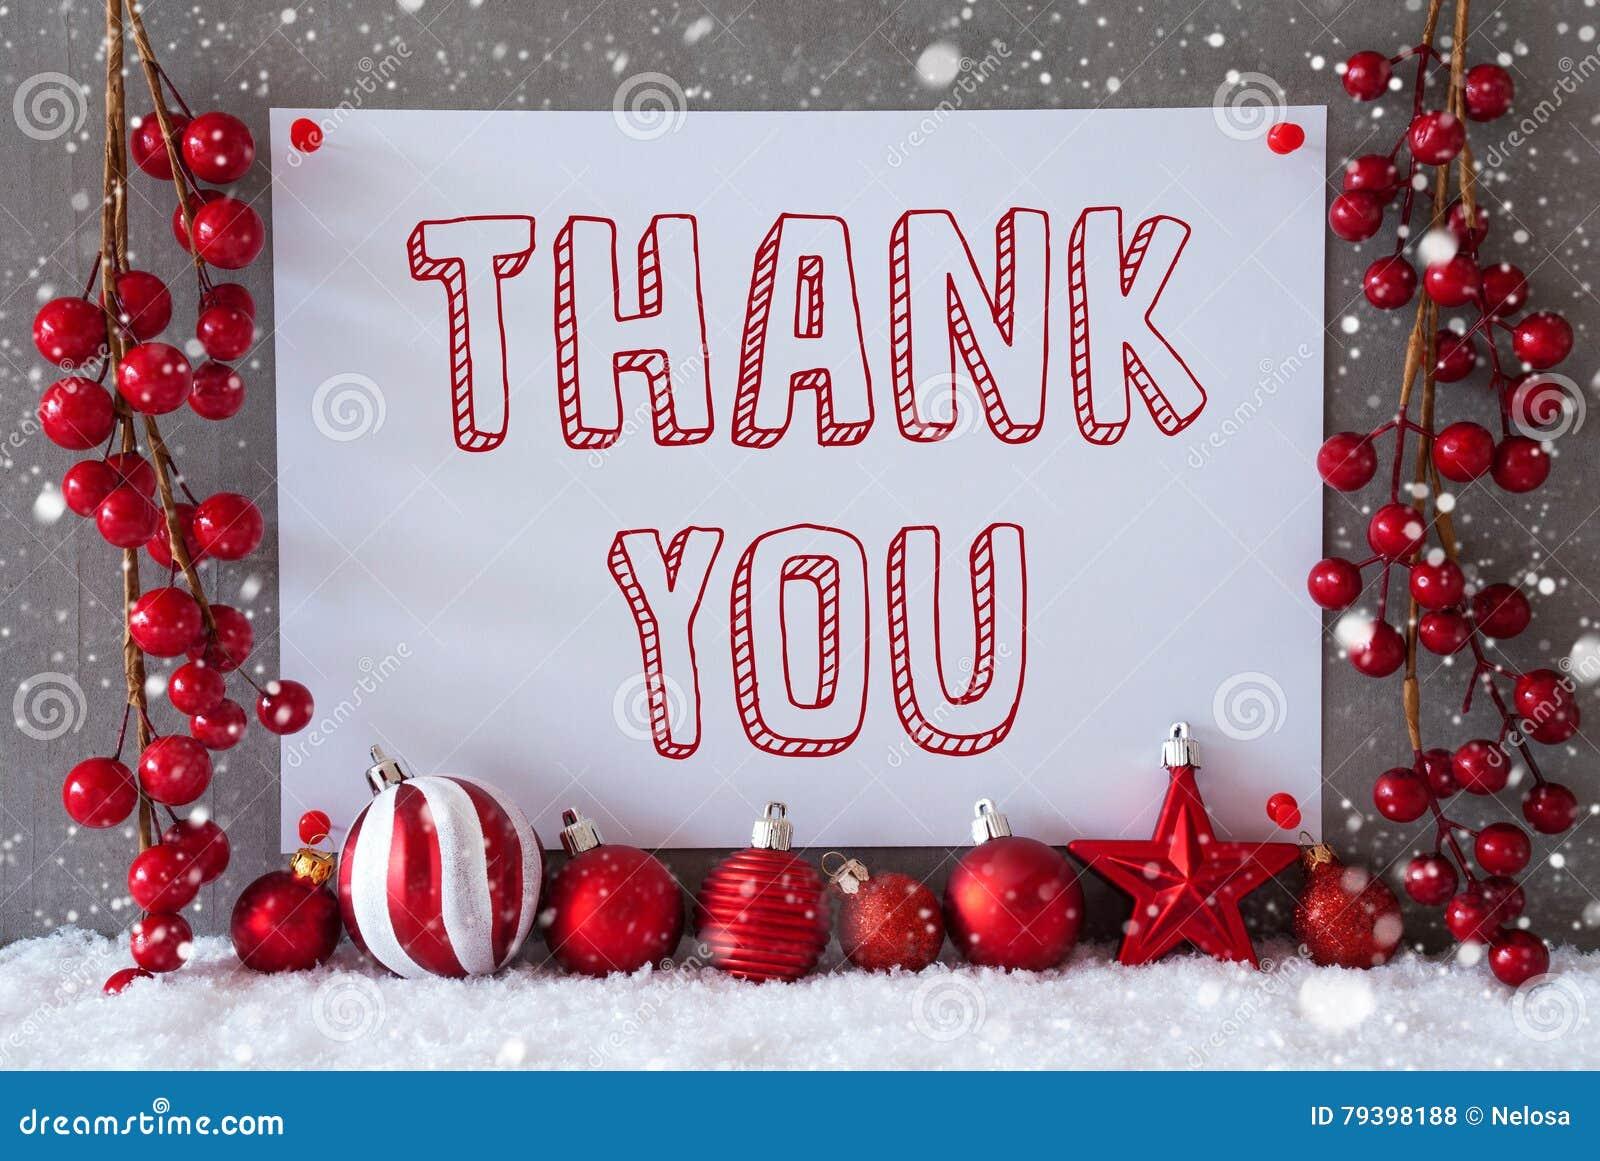 Label, Snowflakes, Christmas Balls, Text Thank You